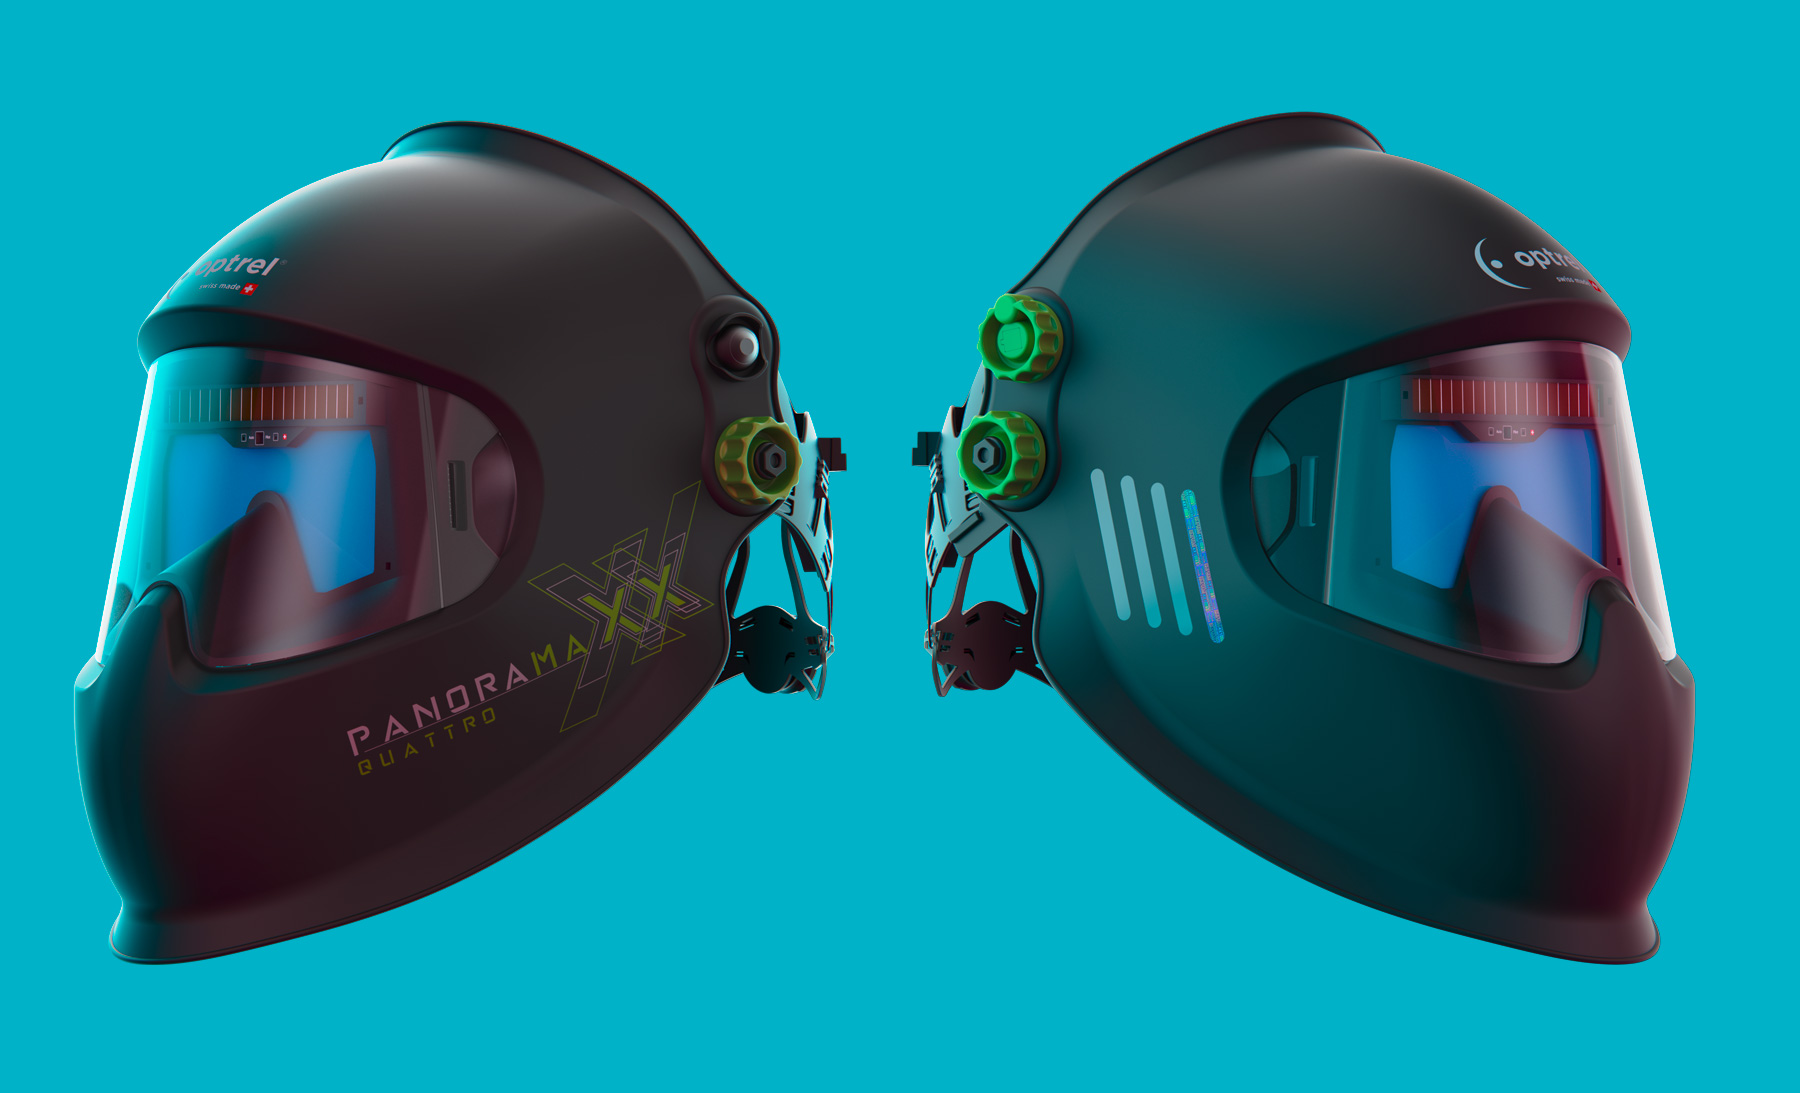 Optrel panoramaxx quattro with hologram